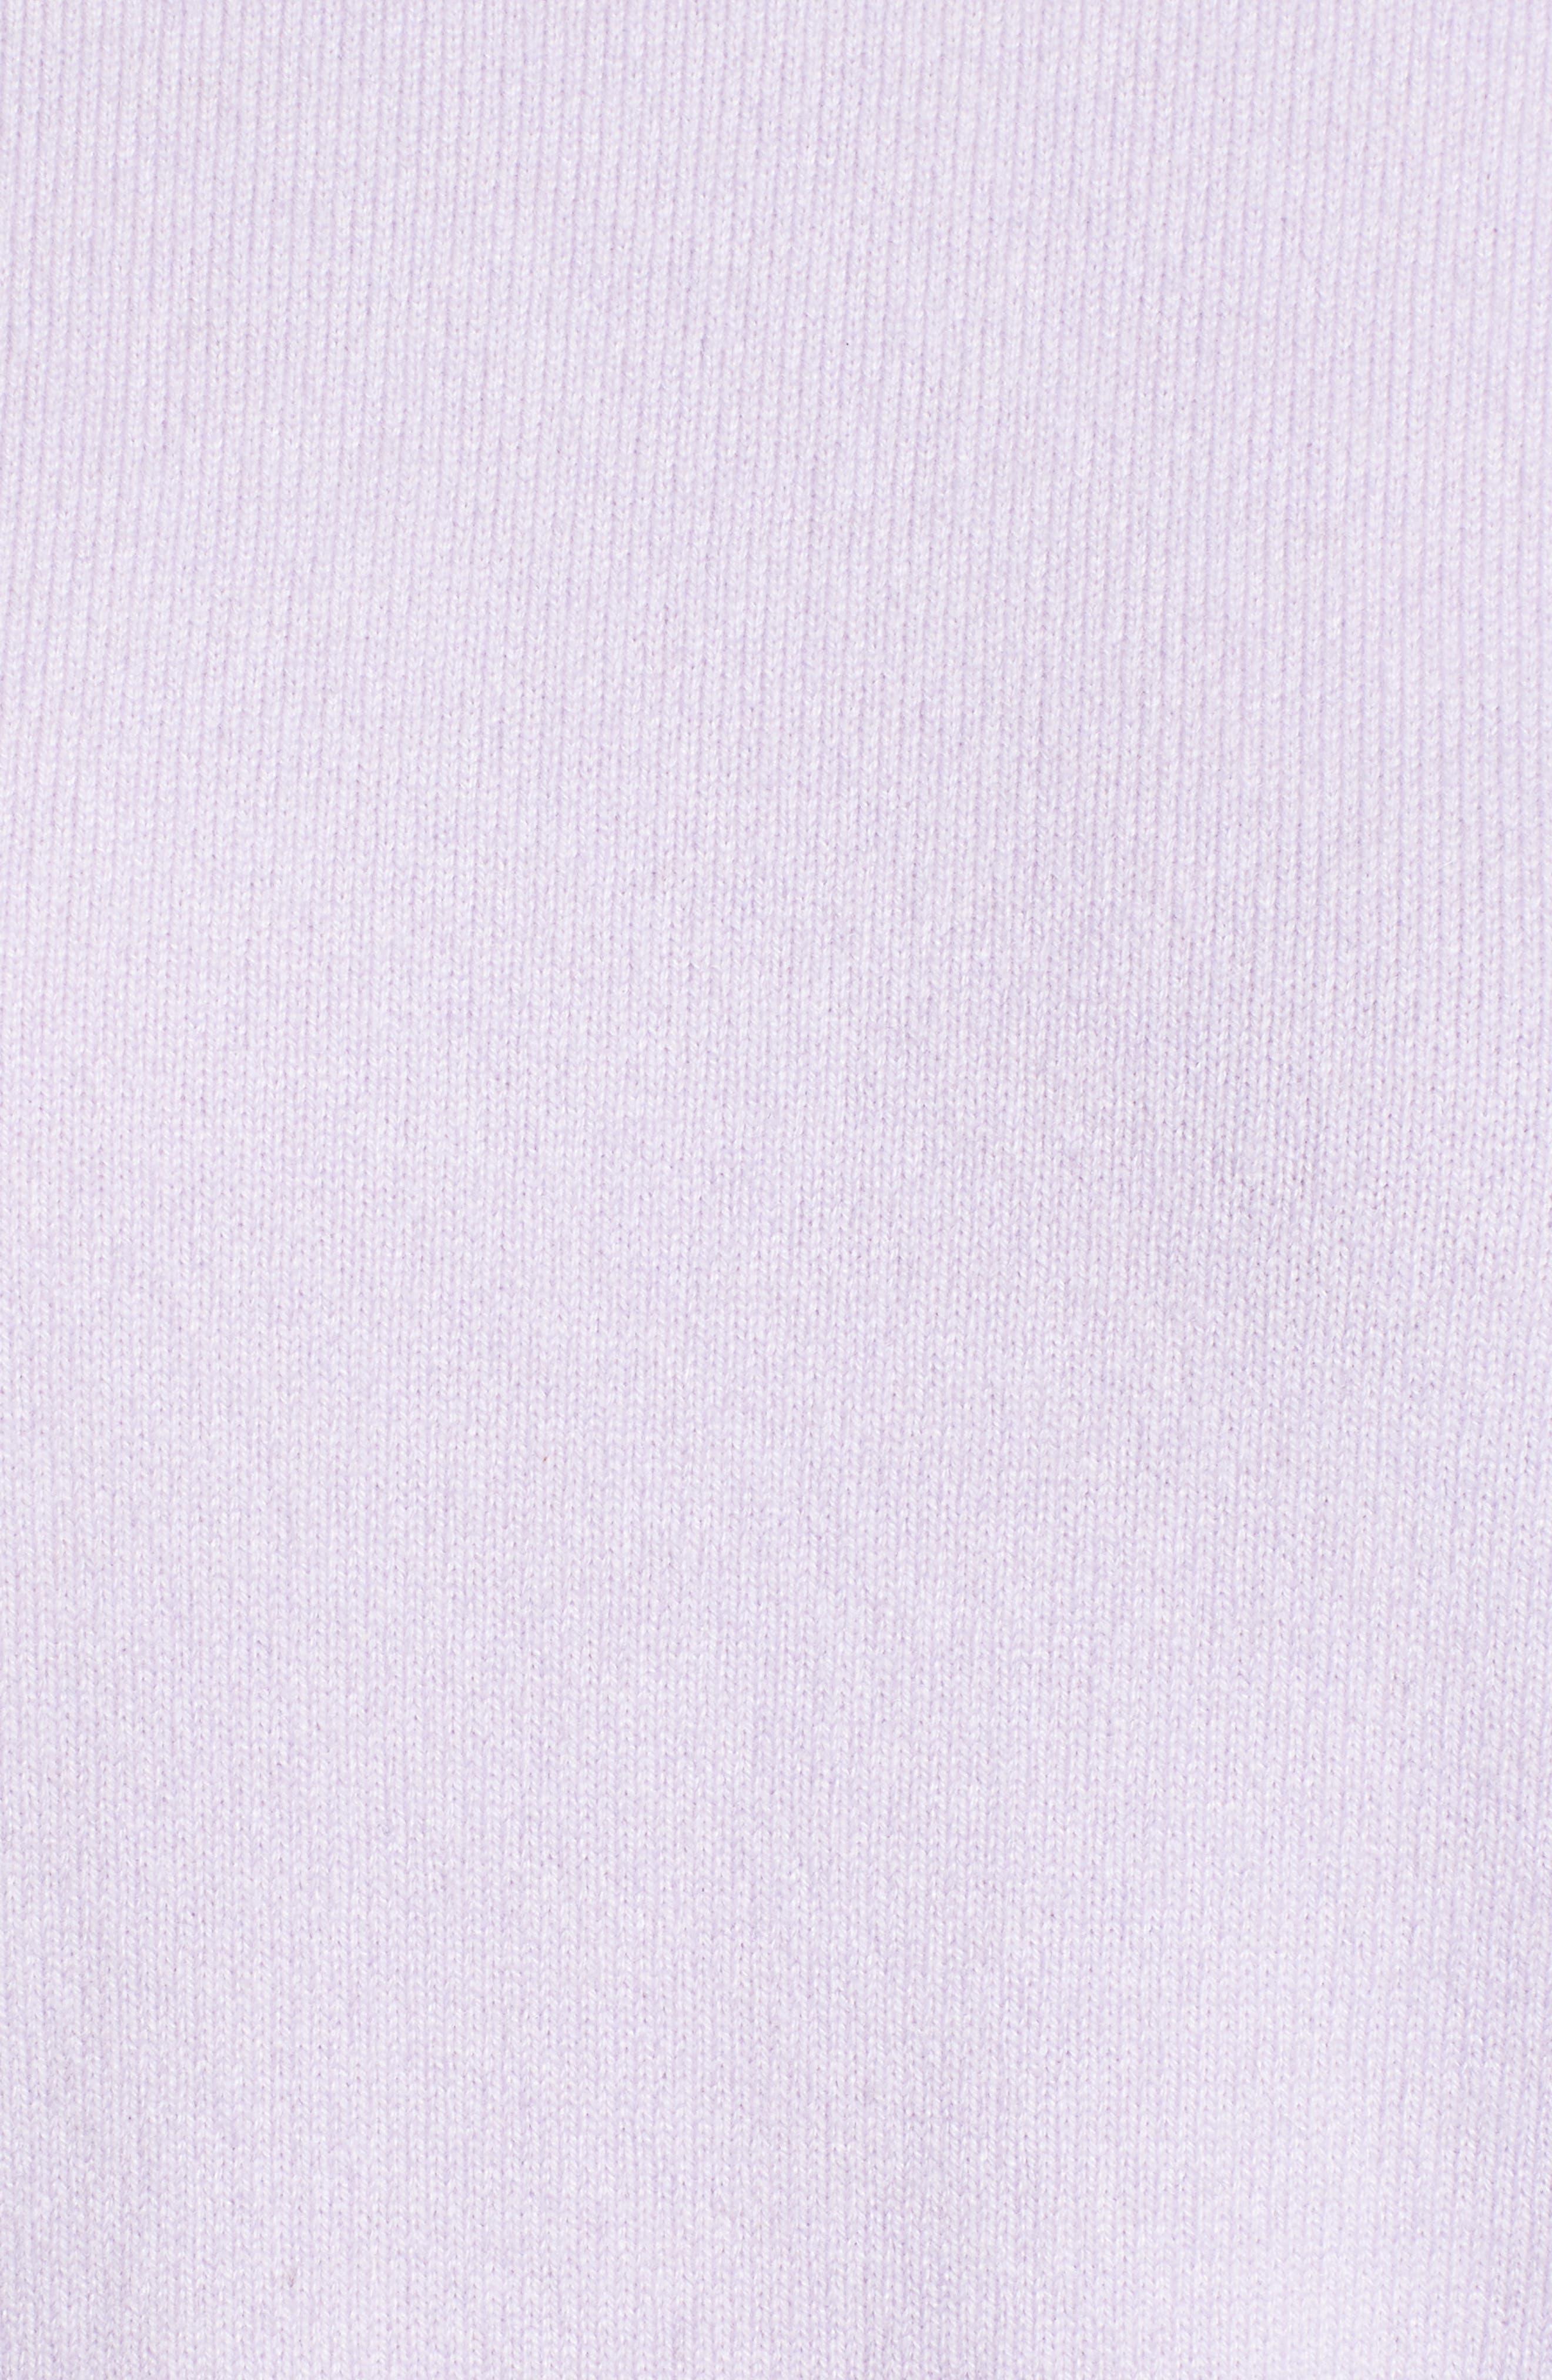 Blouson Sleeve Cashmere Blend Sweater,                             Alternate thumbnail 5, color,